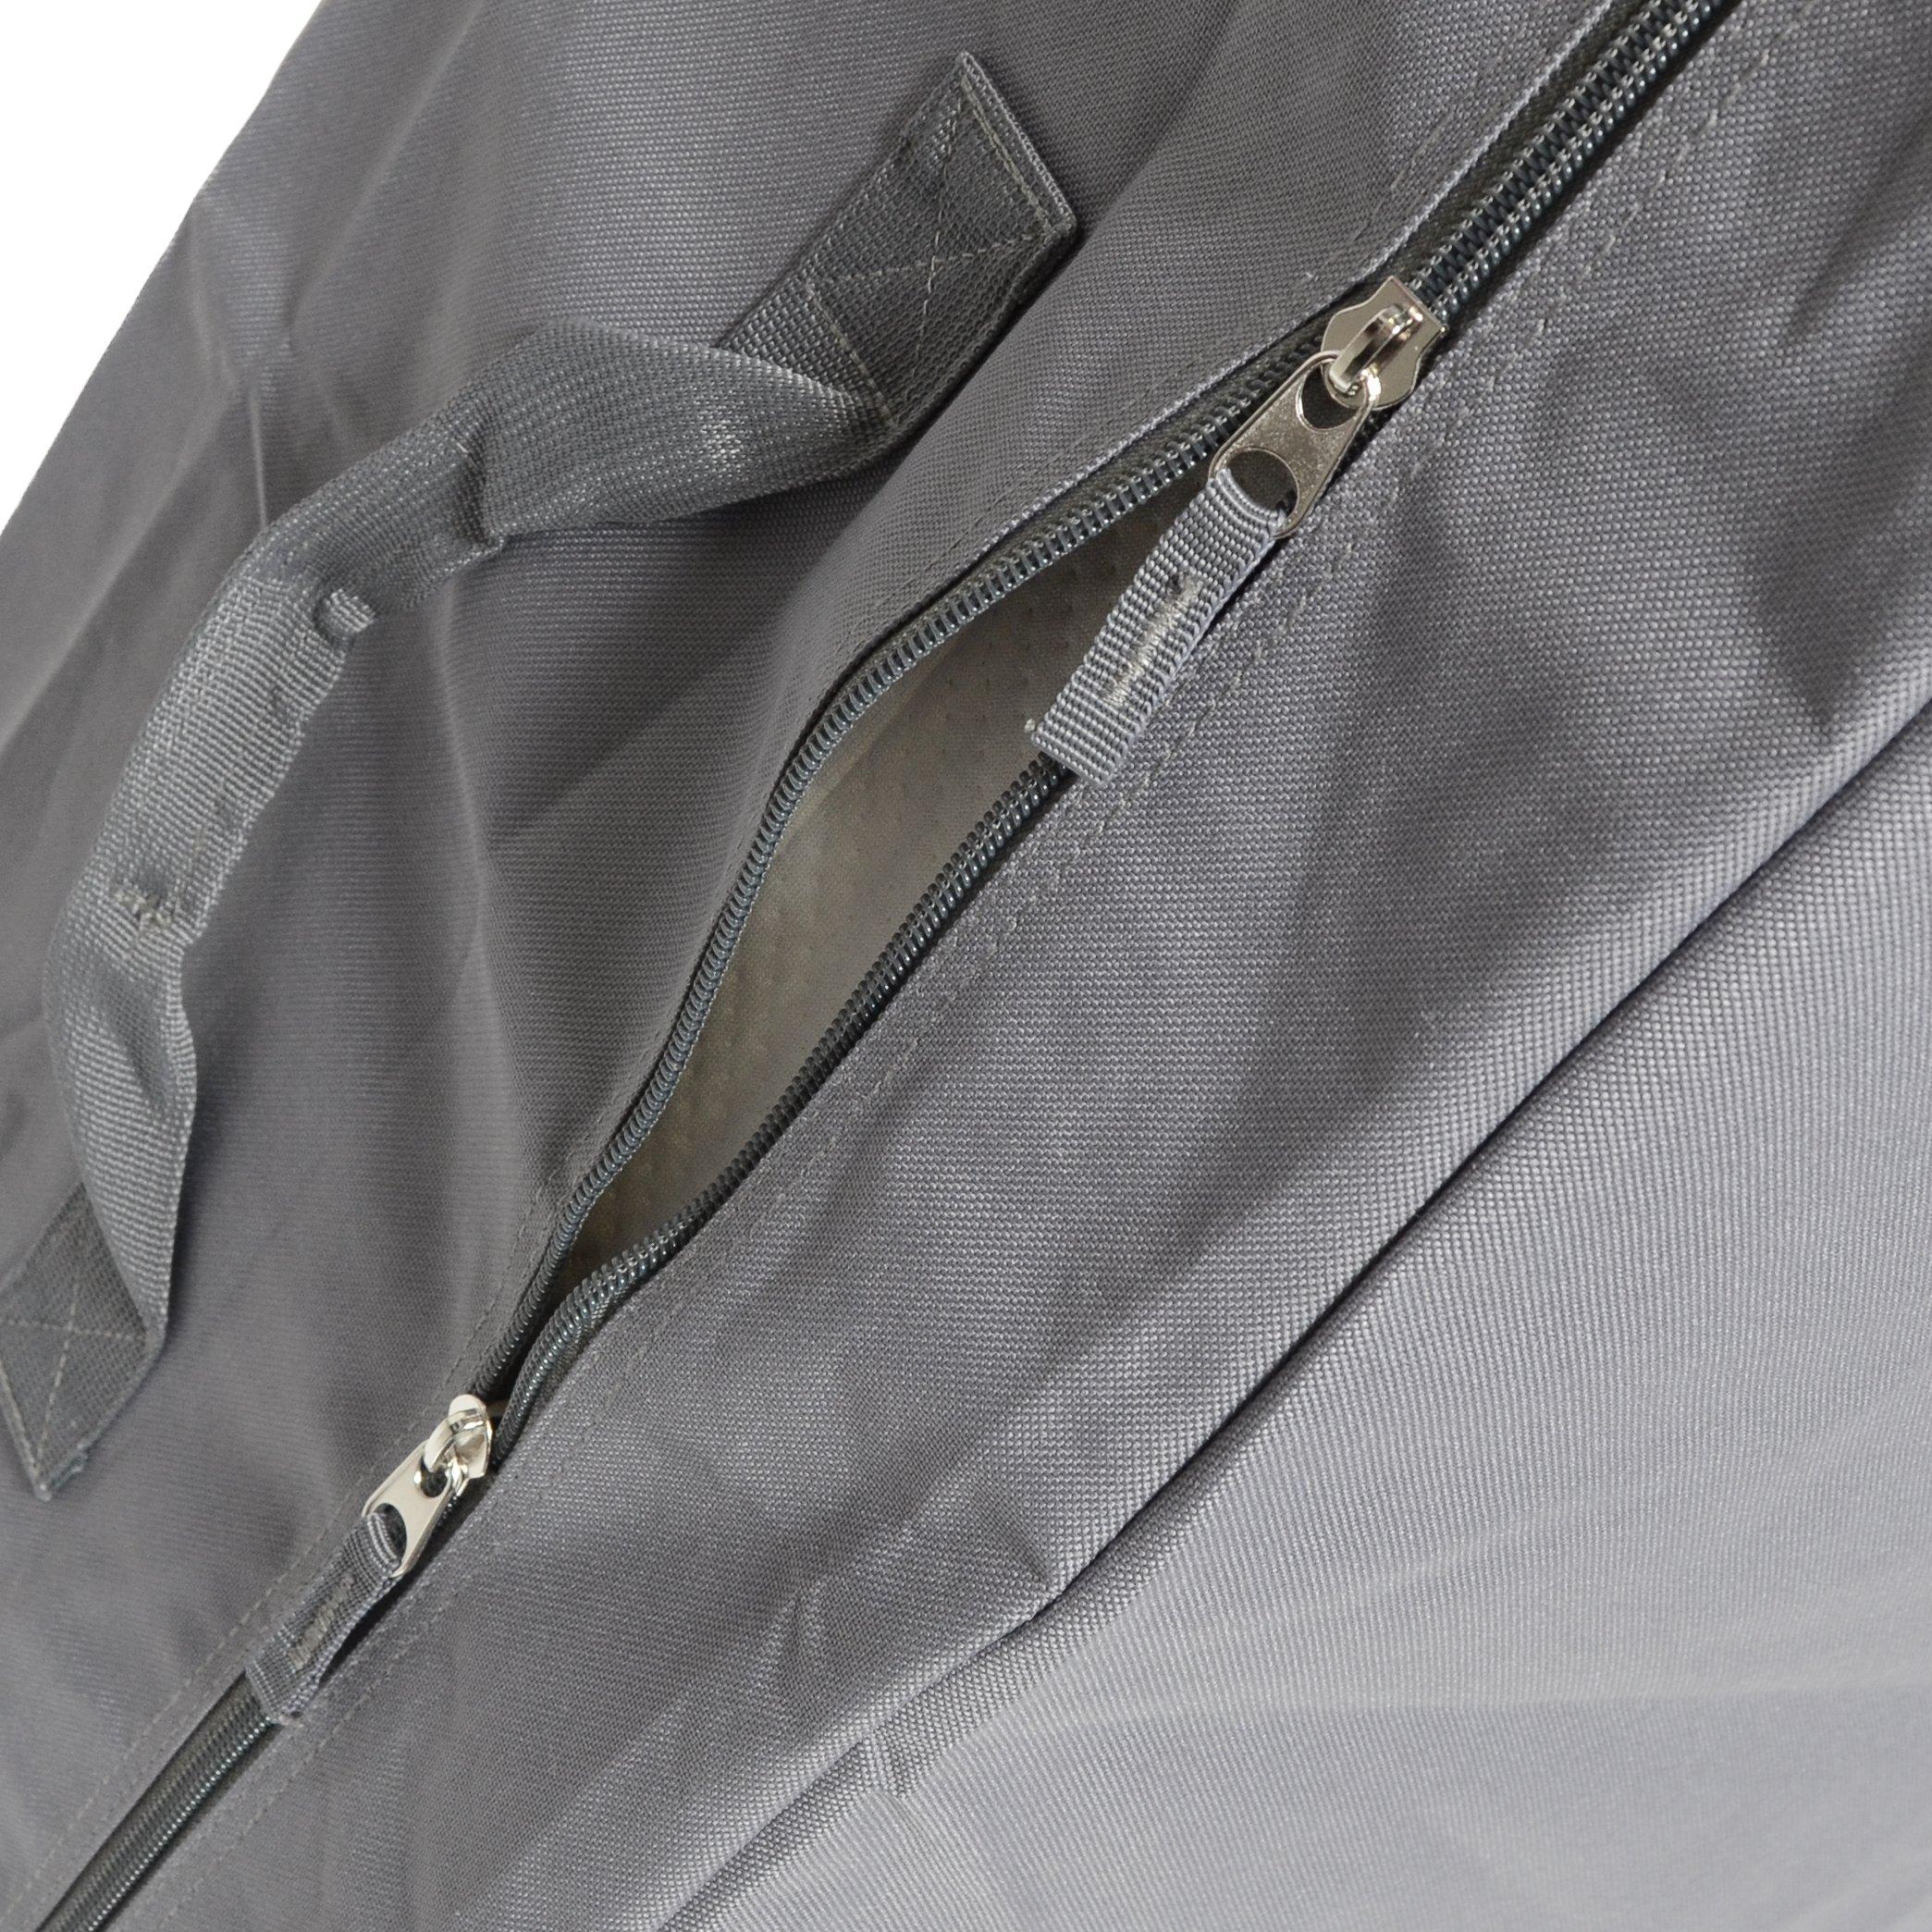 "Carry Case For Milliard Tri-Fold Mattress (6"" Twin ..."